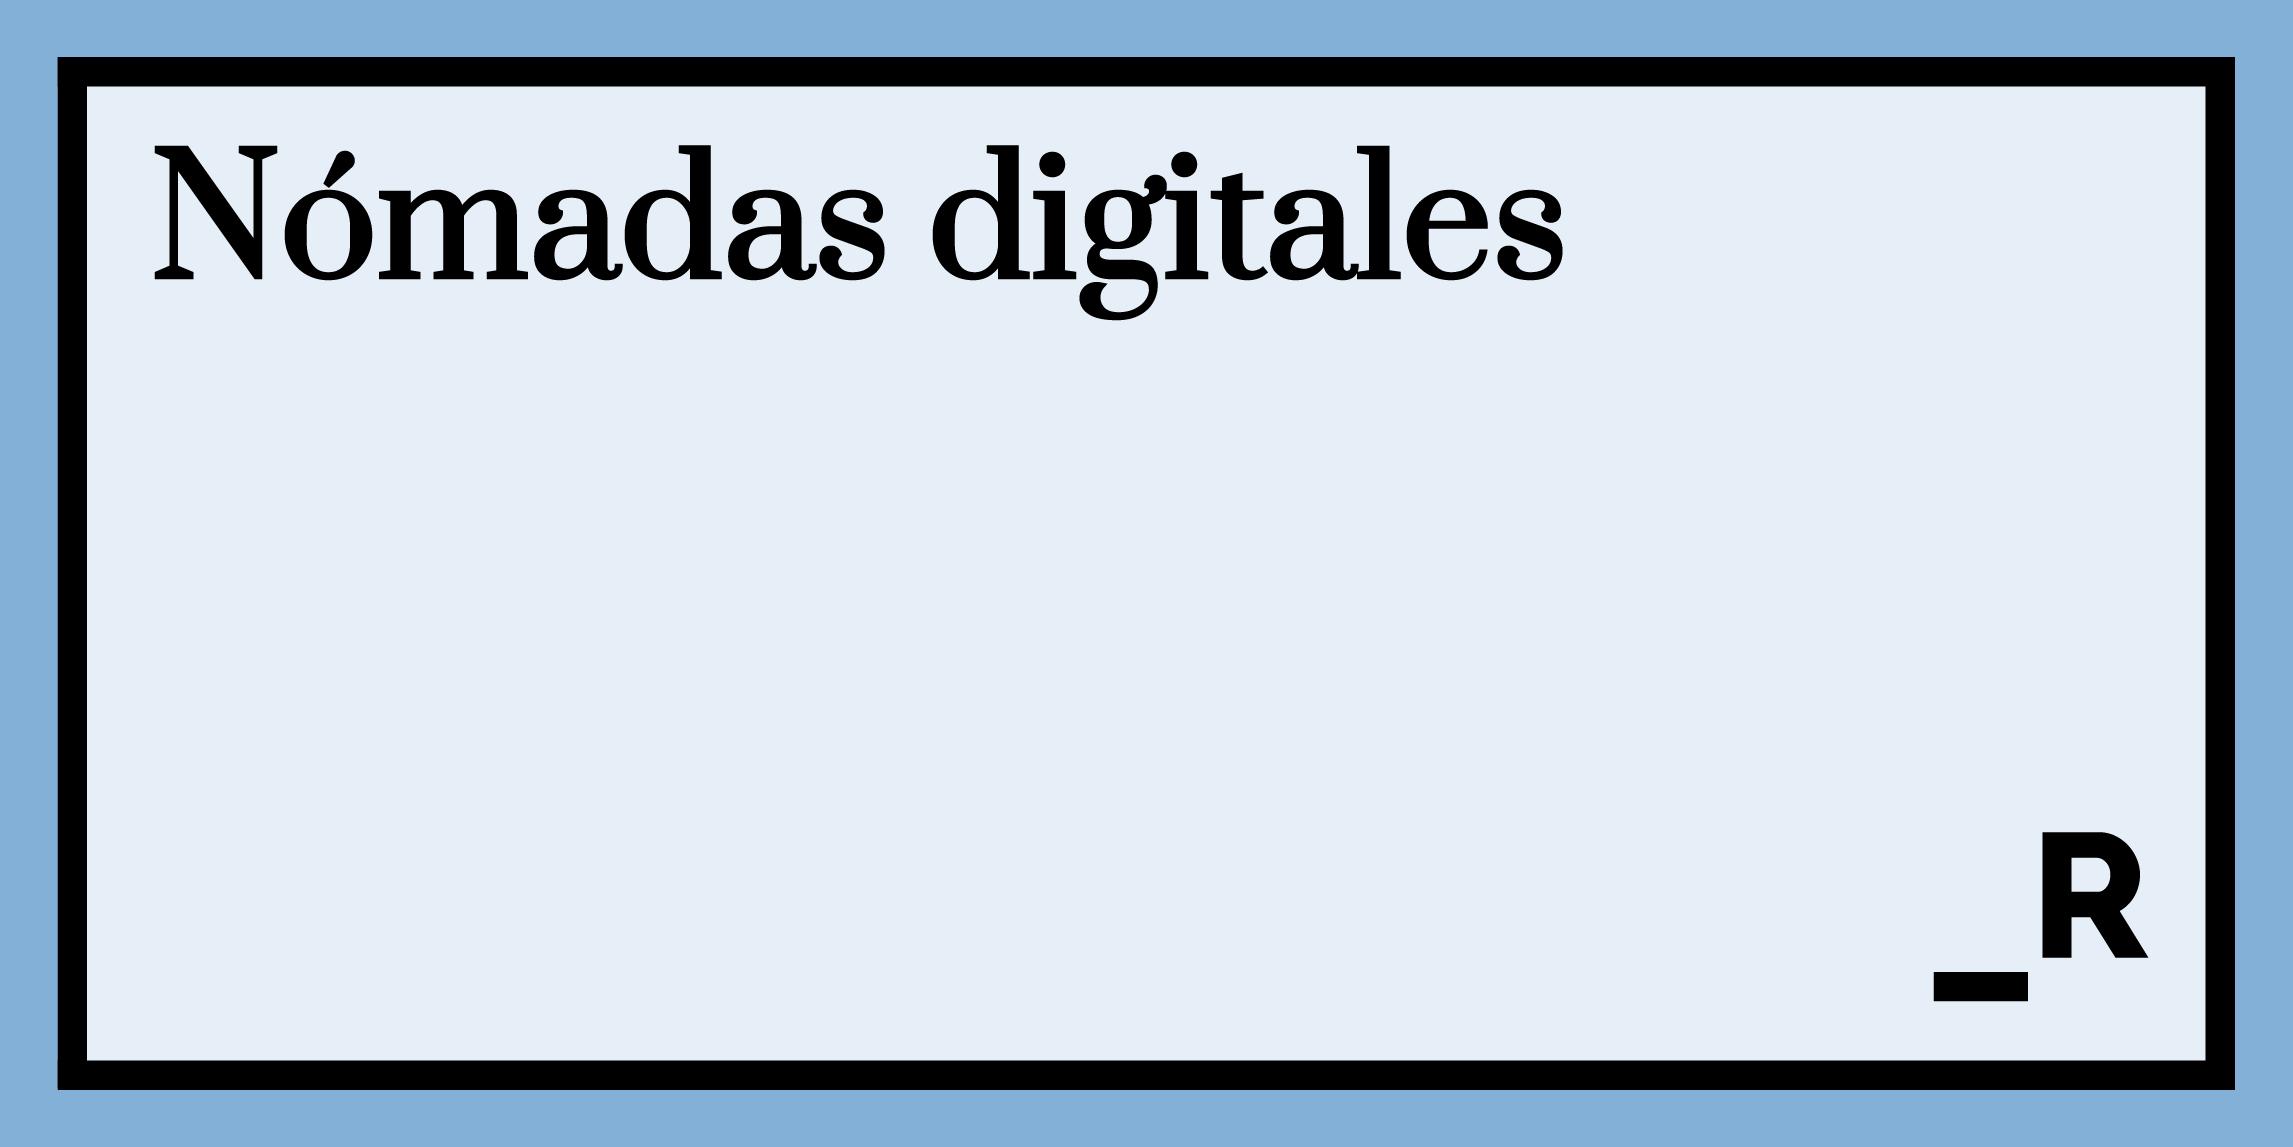 Nómadas digitales